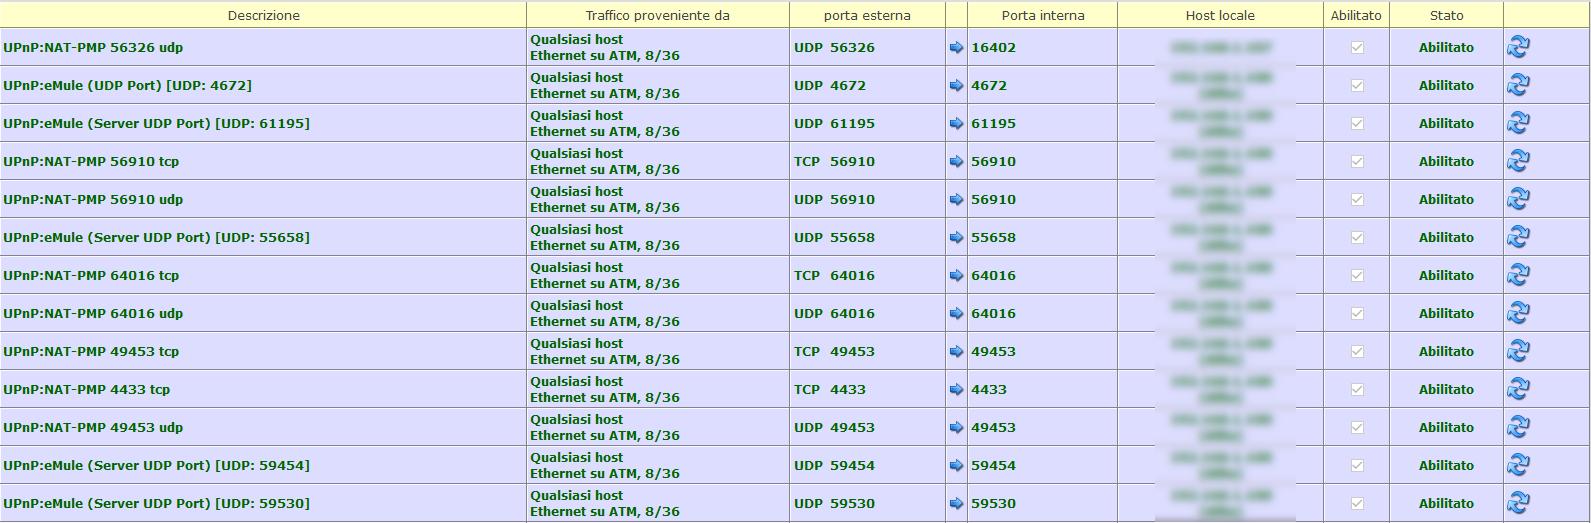 Cancellare porte su ADB VV 2222 modem fastweb - Assistenza